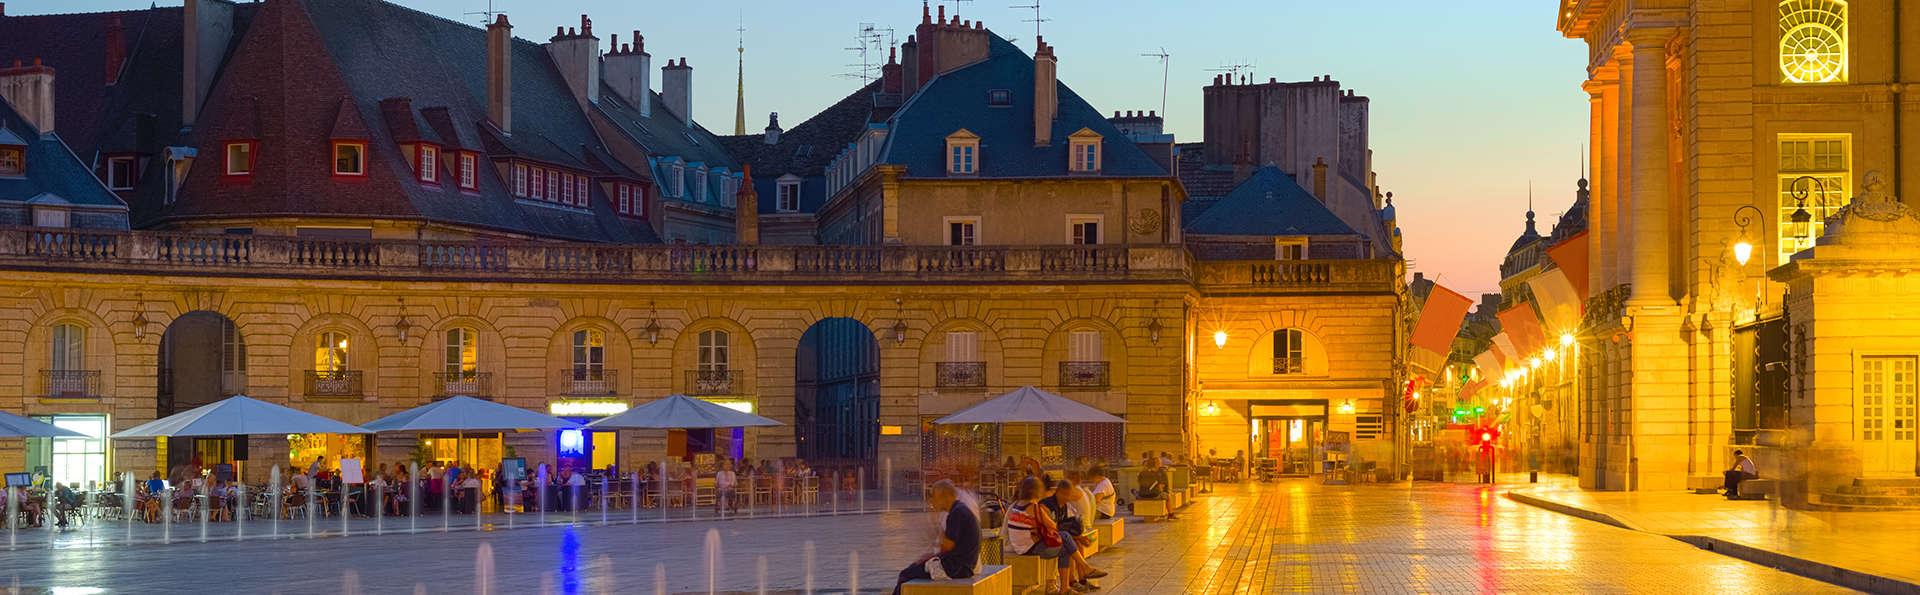 Kyriad Dijon Gare - EDIT_DIJON_03.jpg